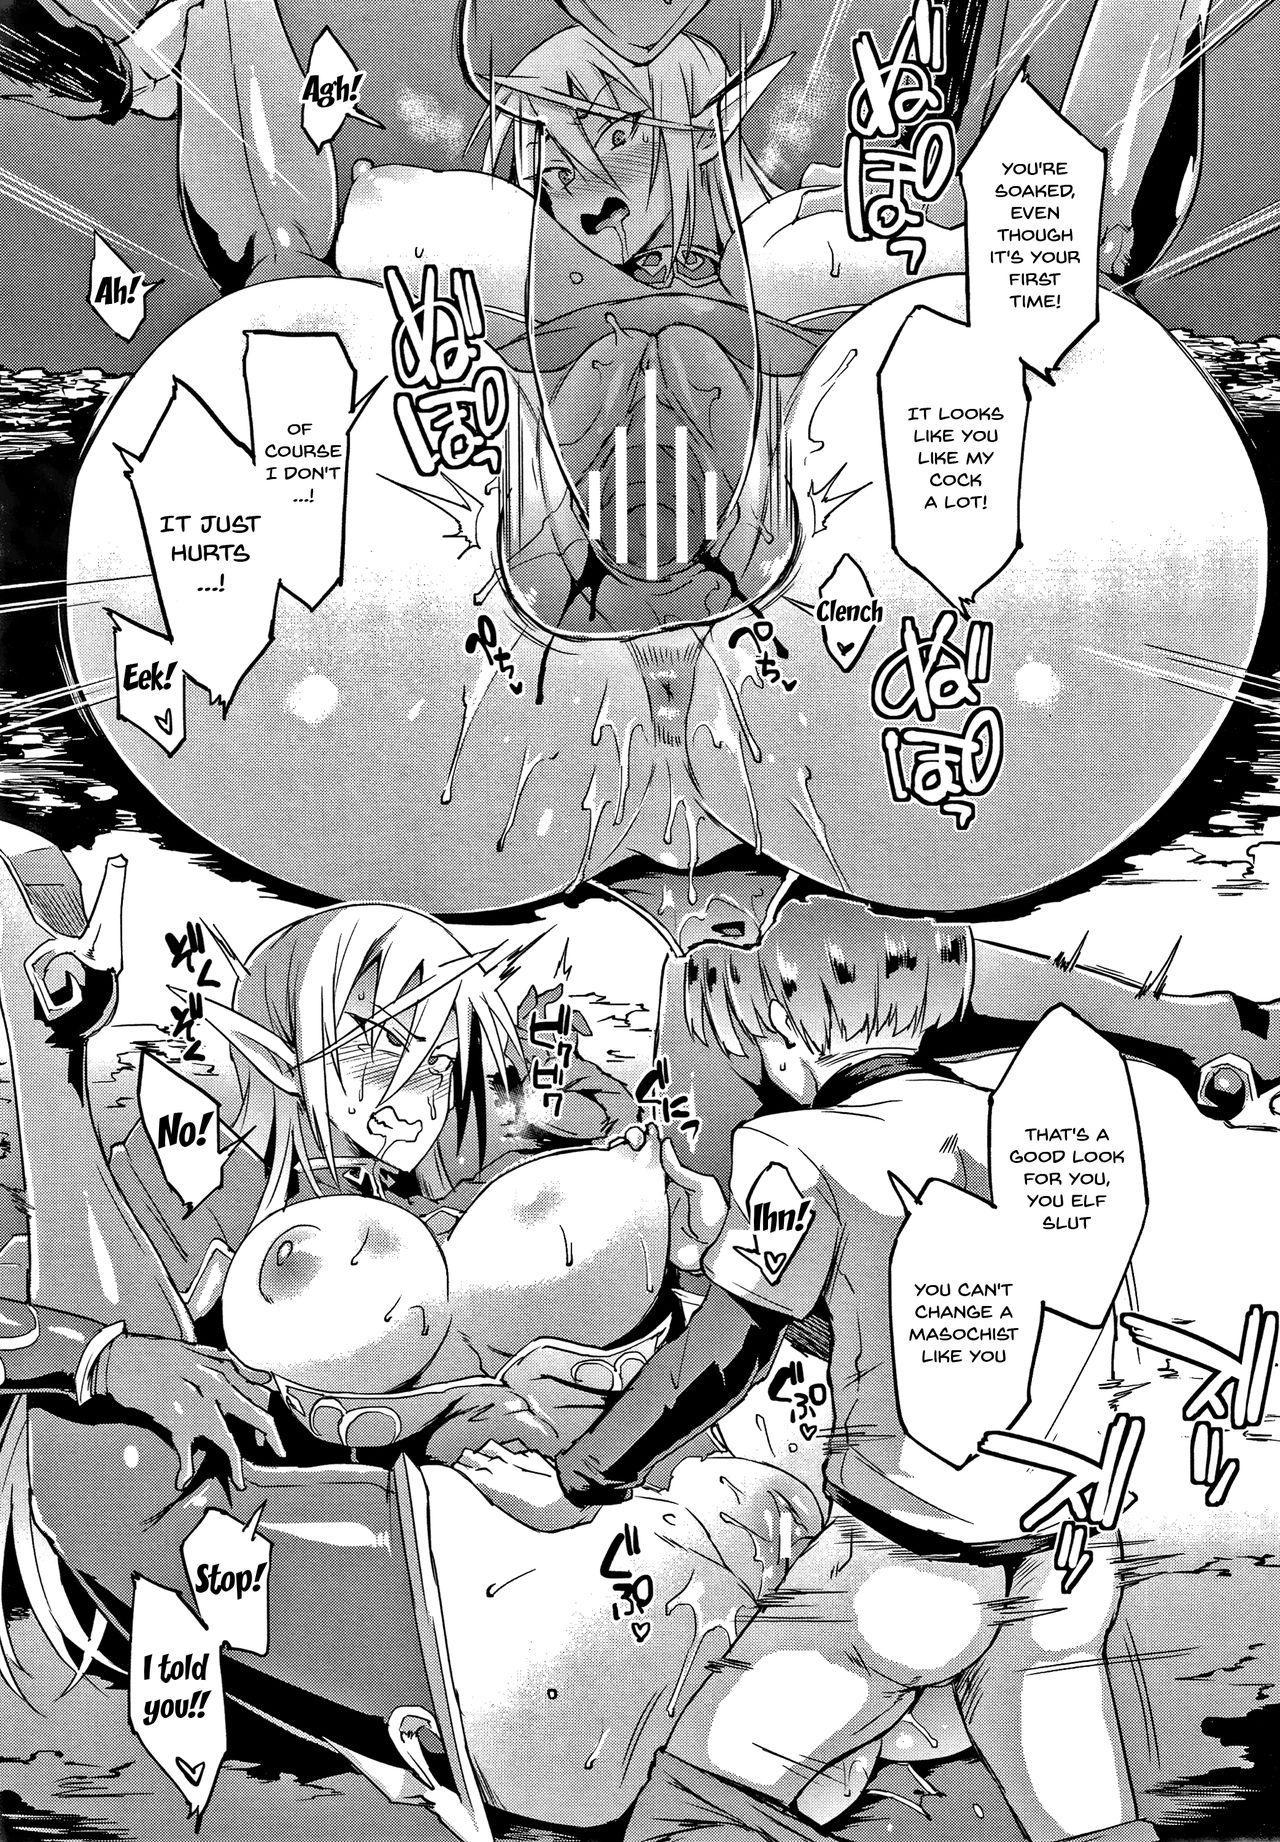 [Fan no Hitori] Sennen Reijou ~ My Lady, My Master ~  Ch.1-2 [English] {Doujins.com} 15